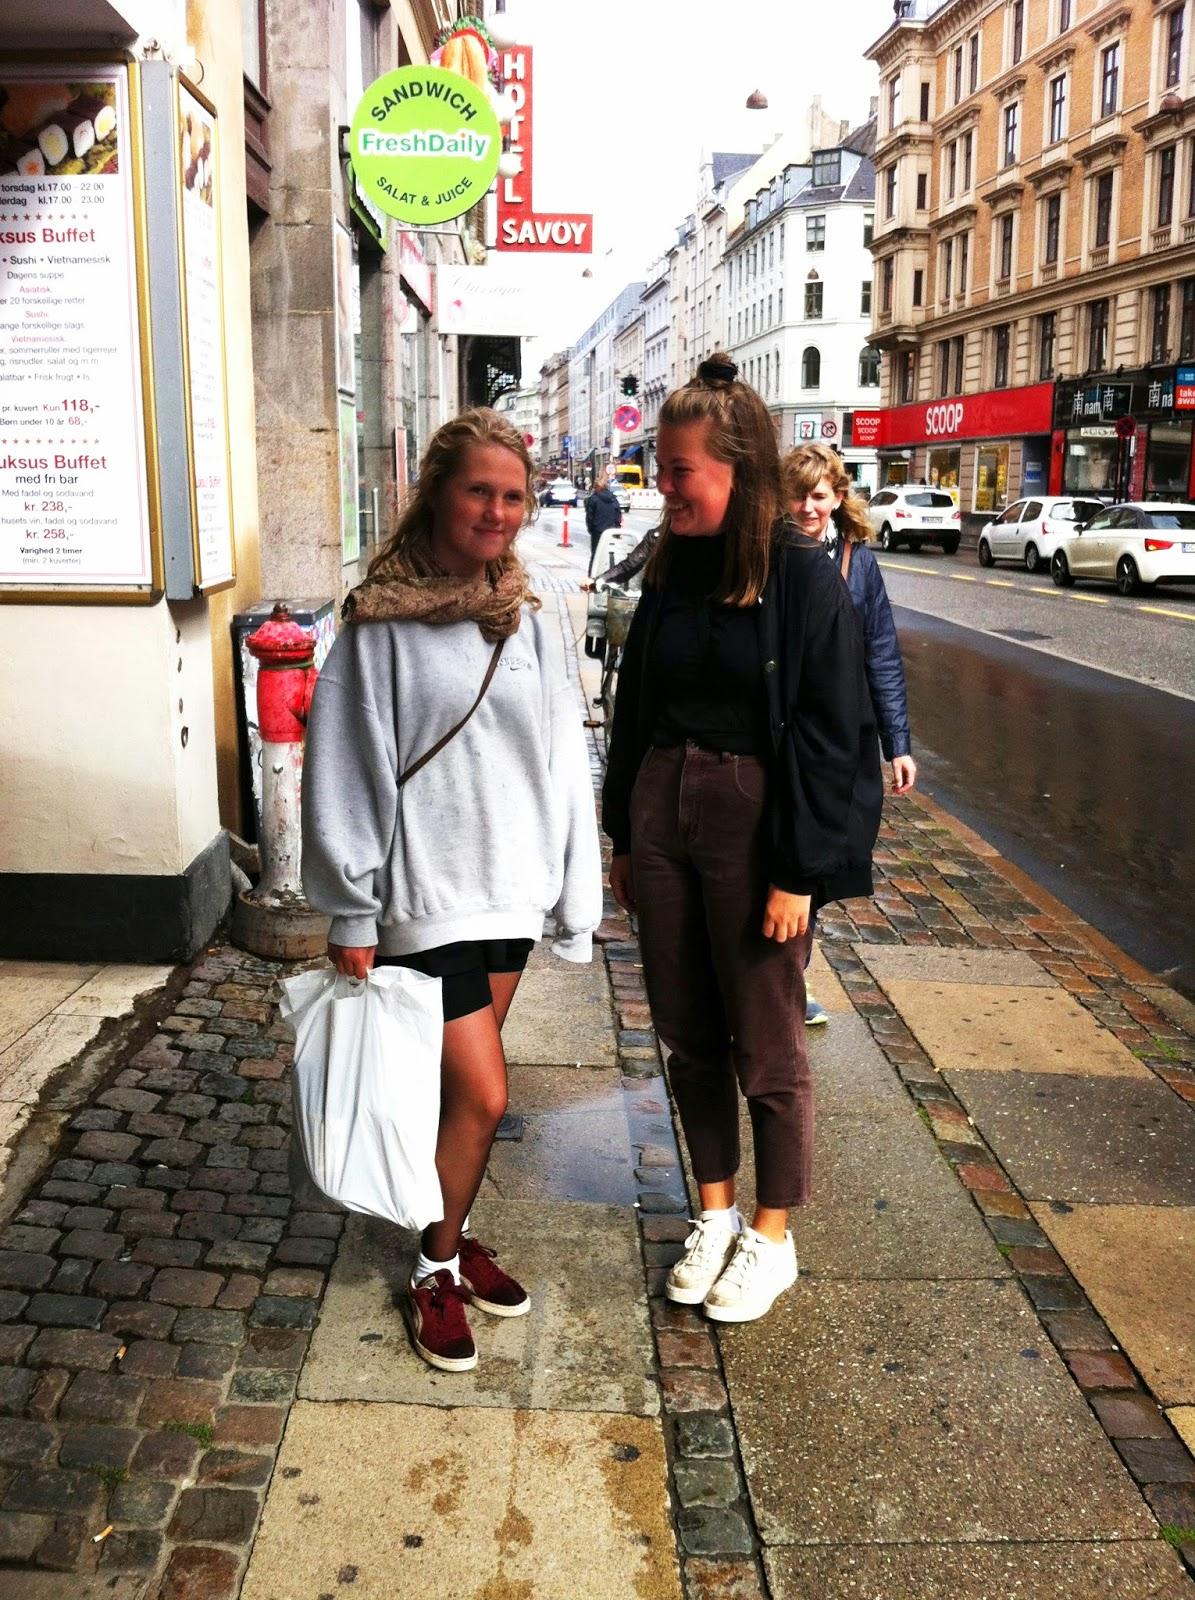 israeli fashion blog, בלוג אופנה, Copenhagen street style